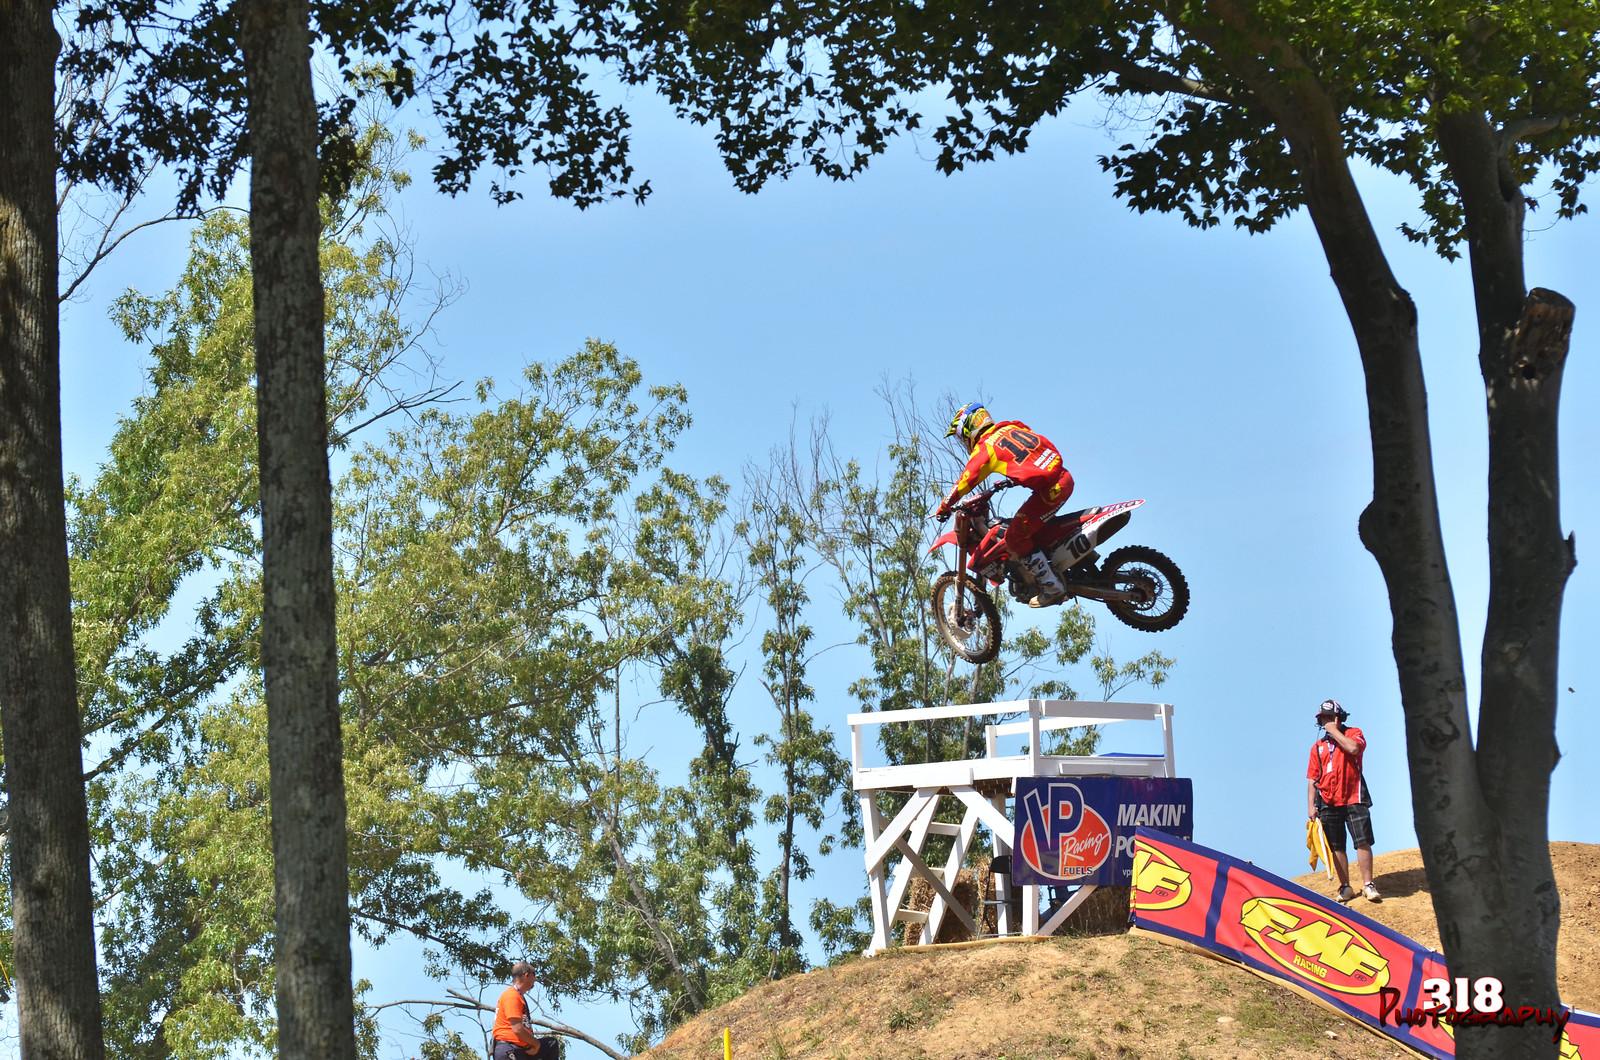 10-03 - MxPro318 - Motocross Pictures - Vital MX